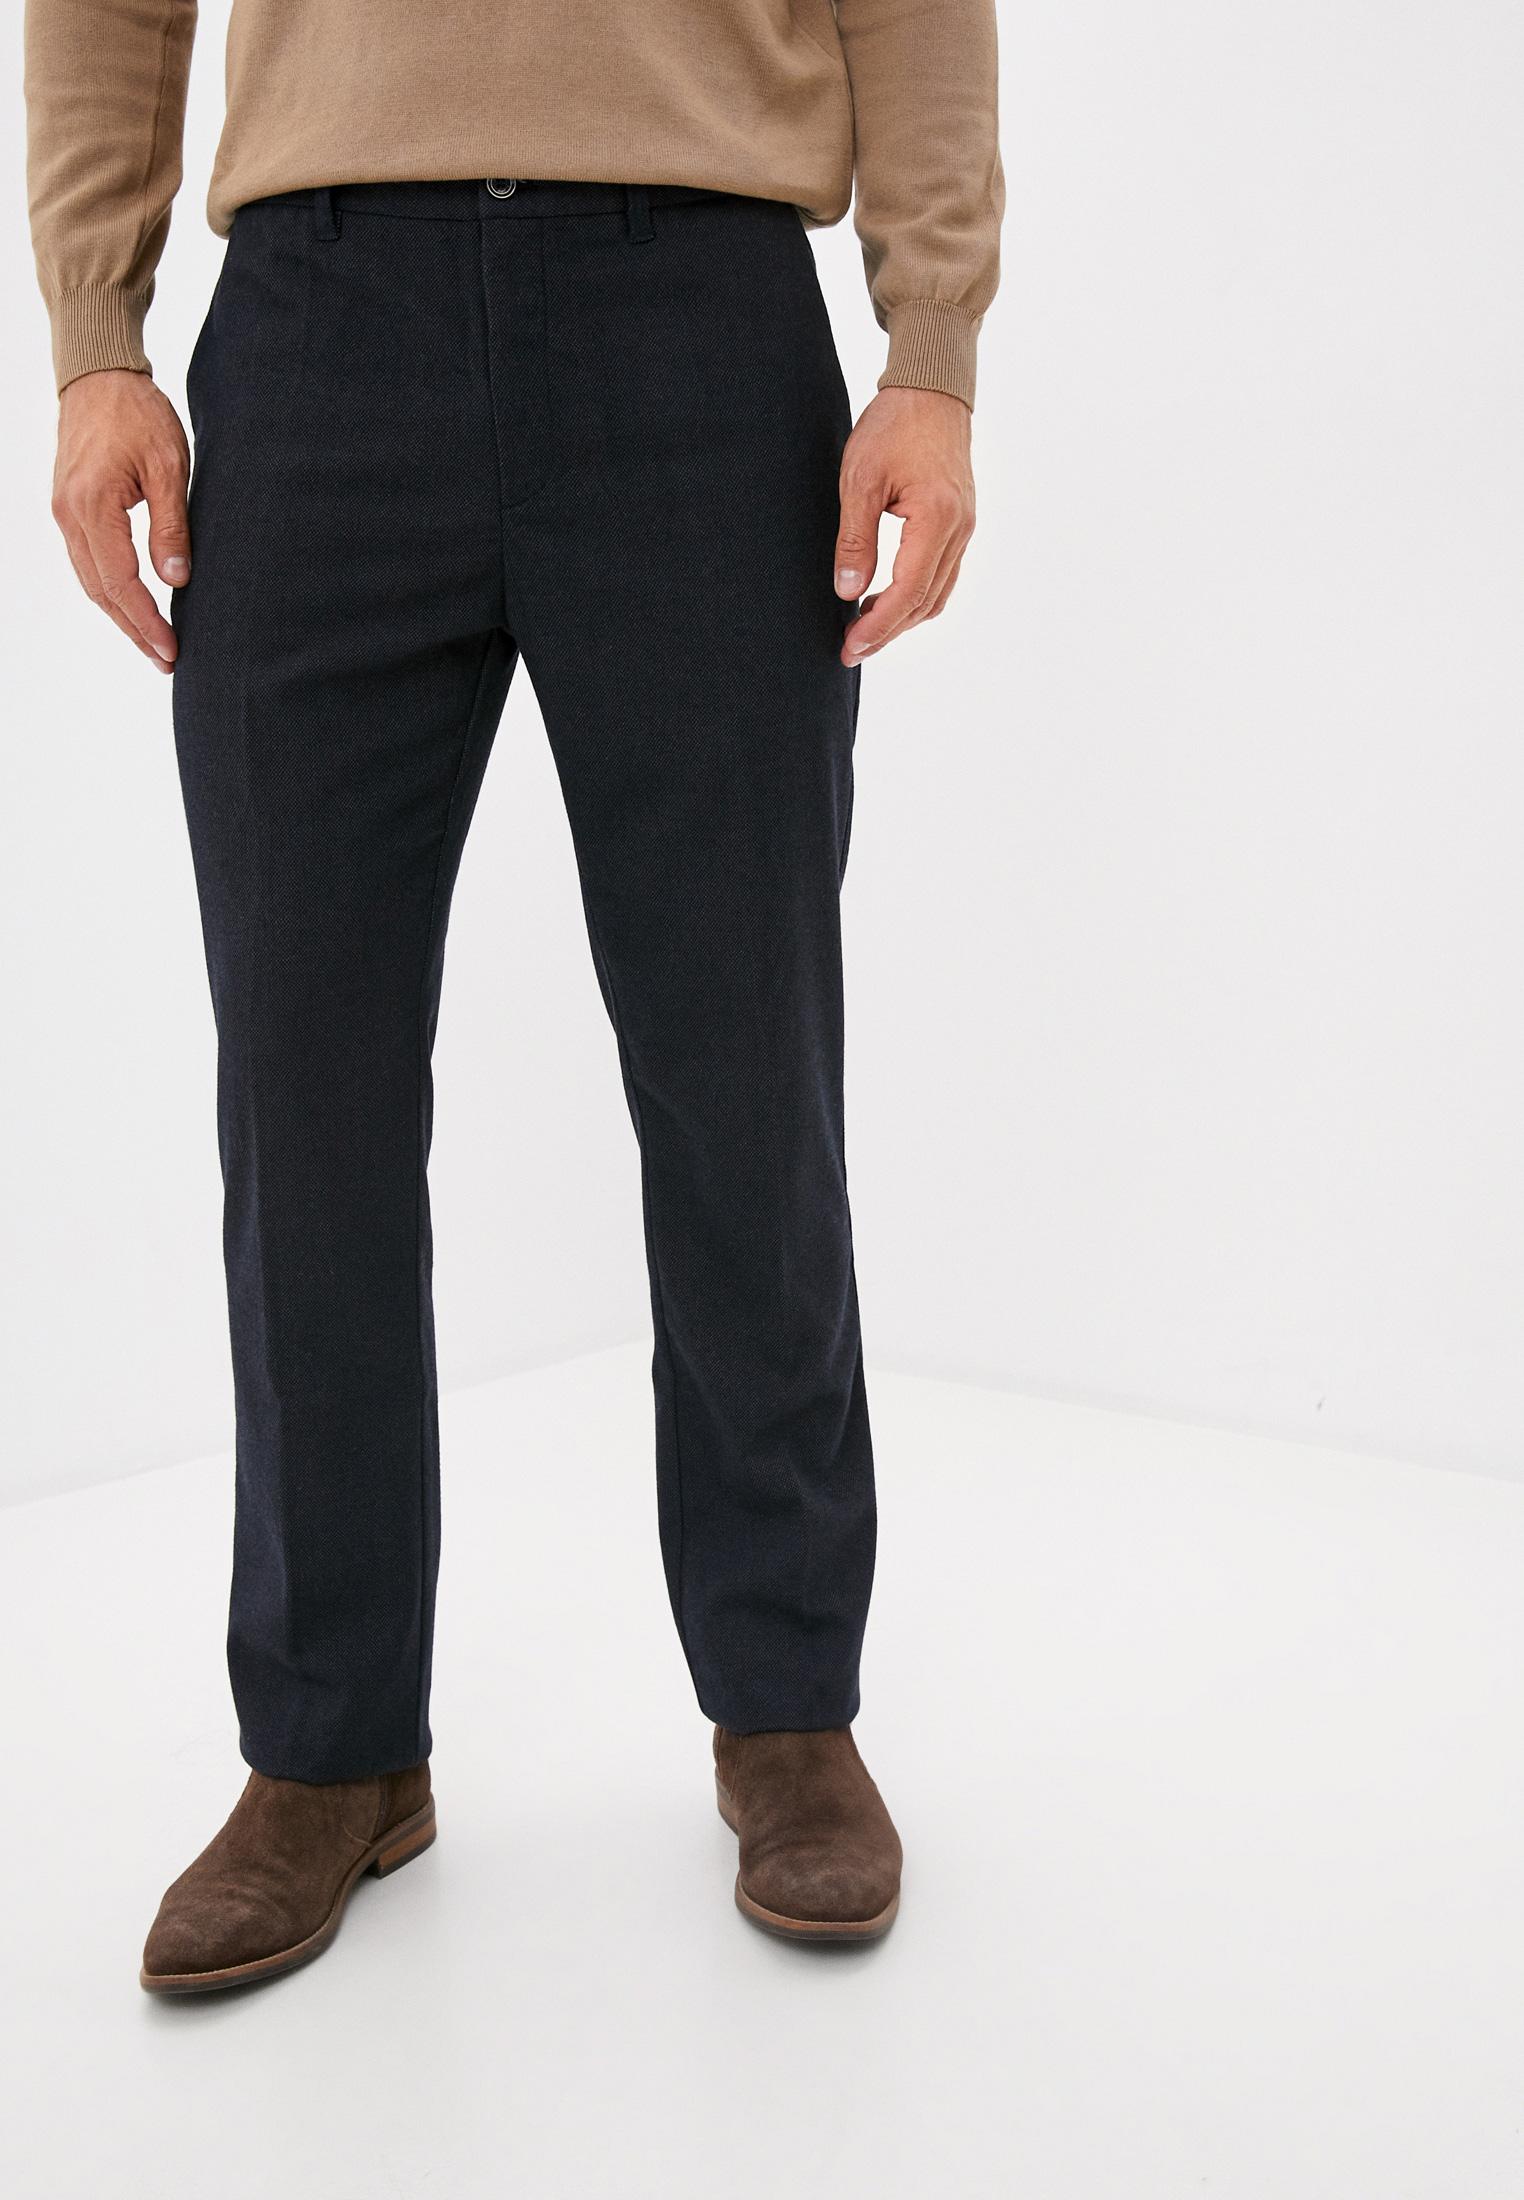 Мужские прямые брюки Zolla Брюки Zolla